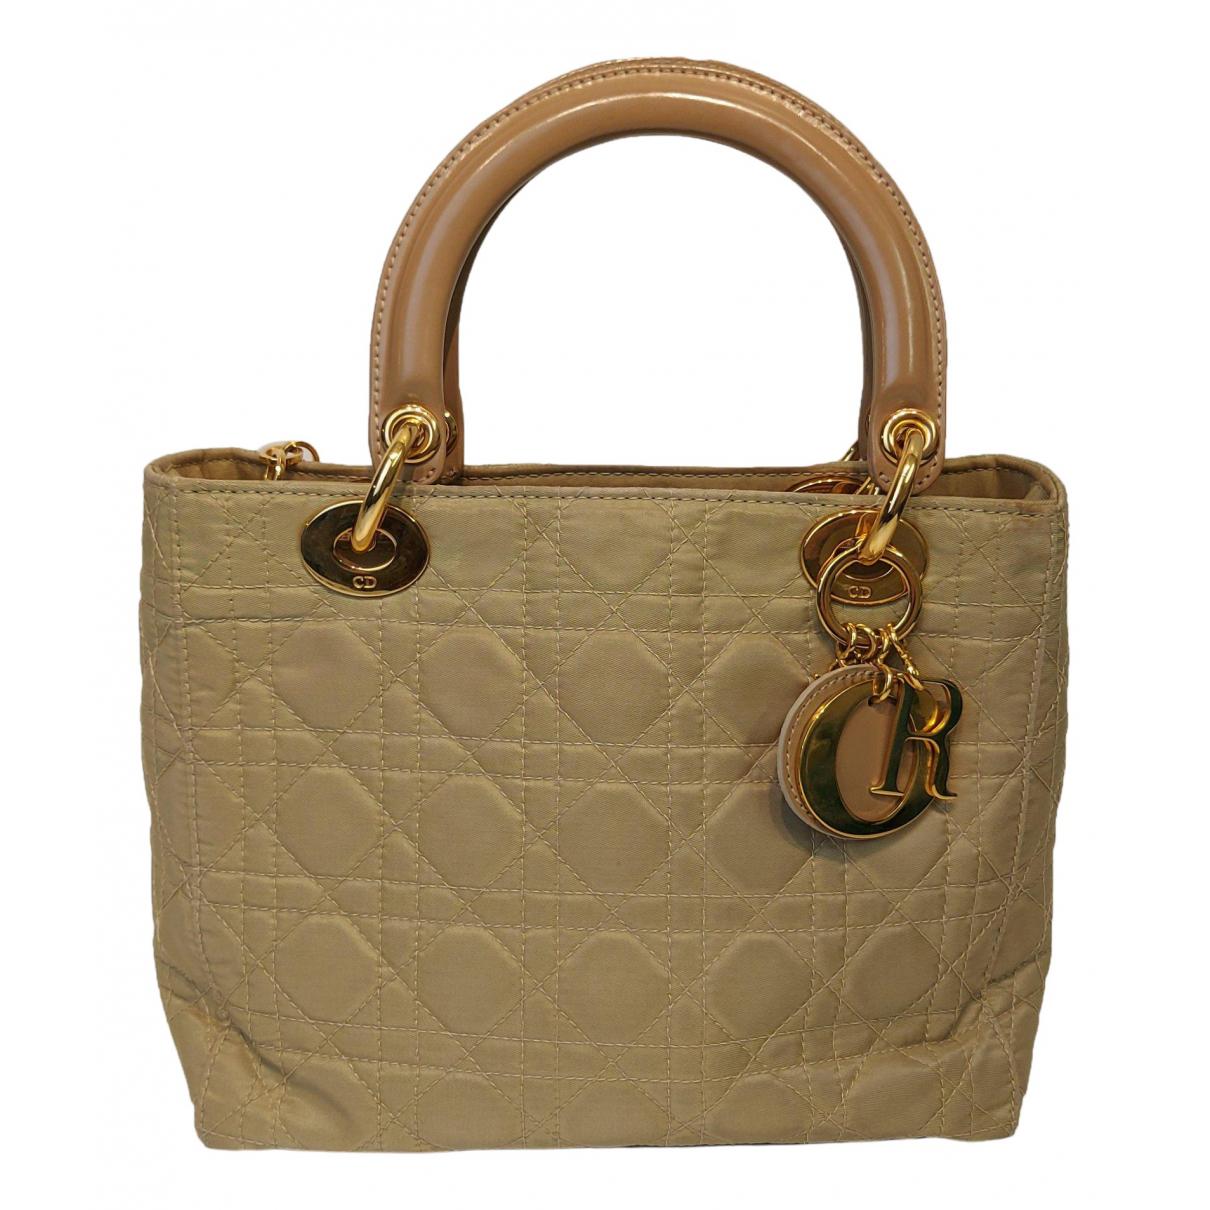 Dior - Sac a main Lady Dior pour femme en toile - beige